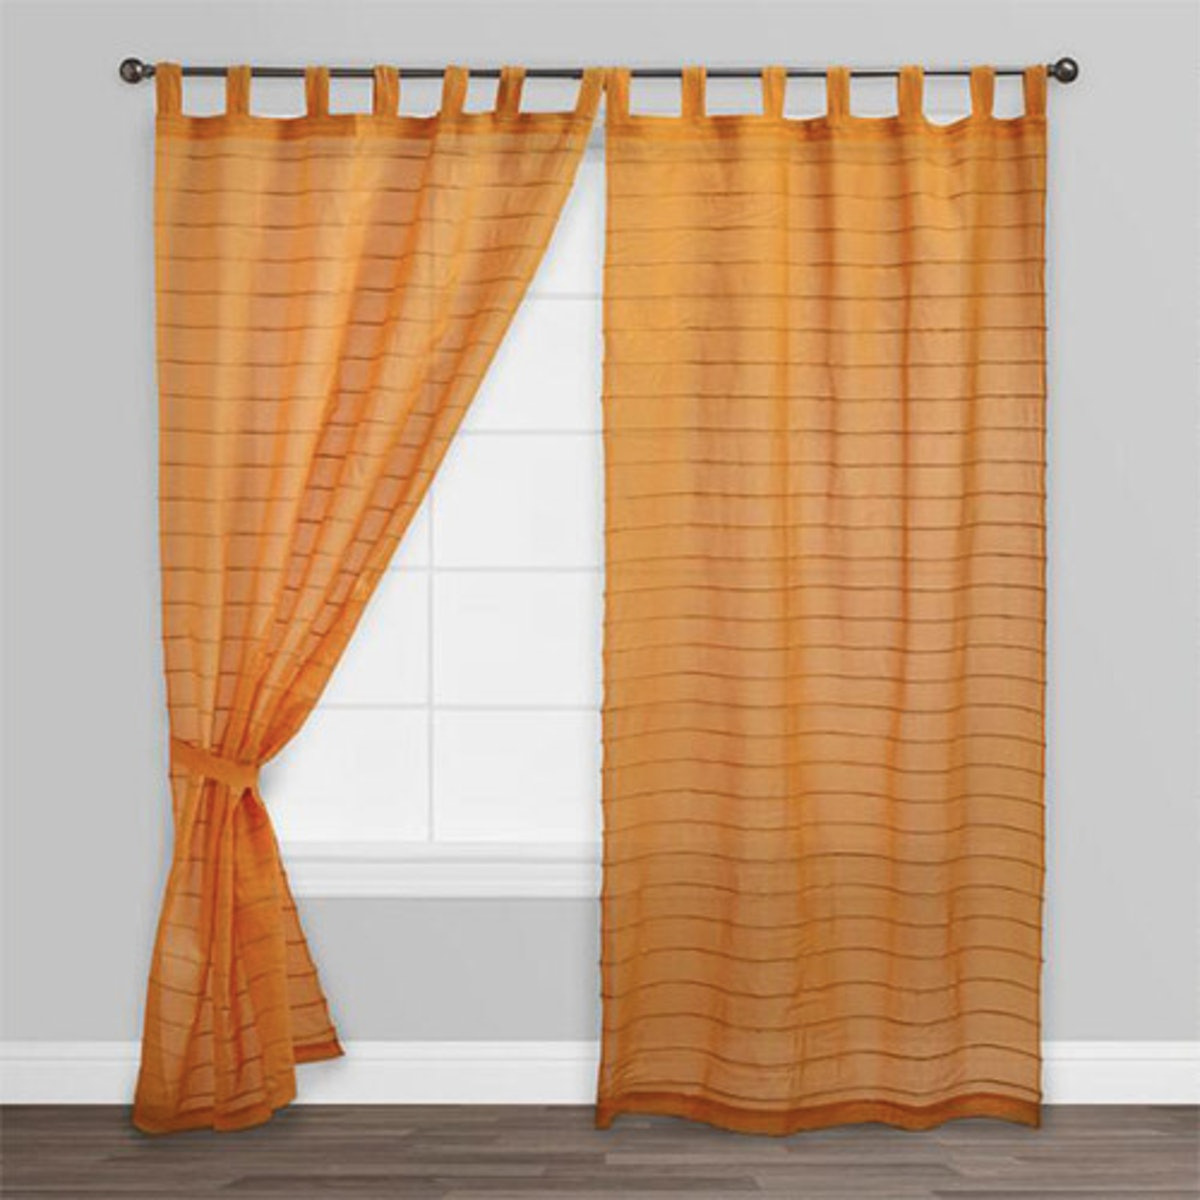 Amber Striped Sahaj Jute Tab Top Curtains, Set Of 2